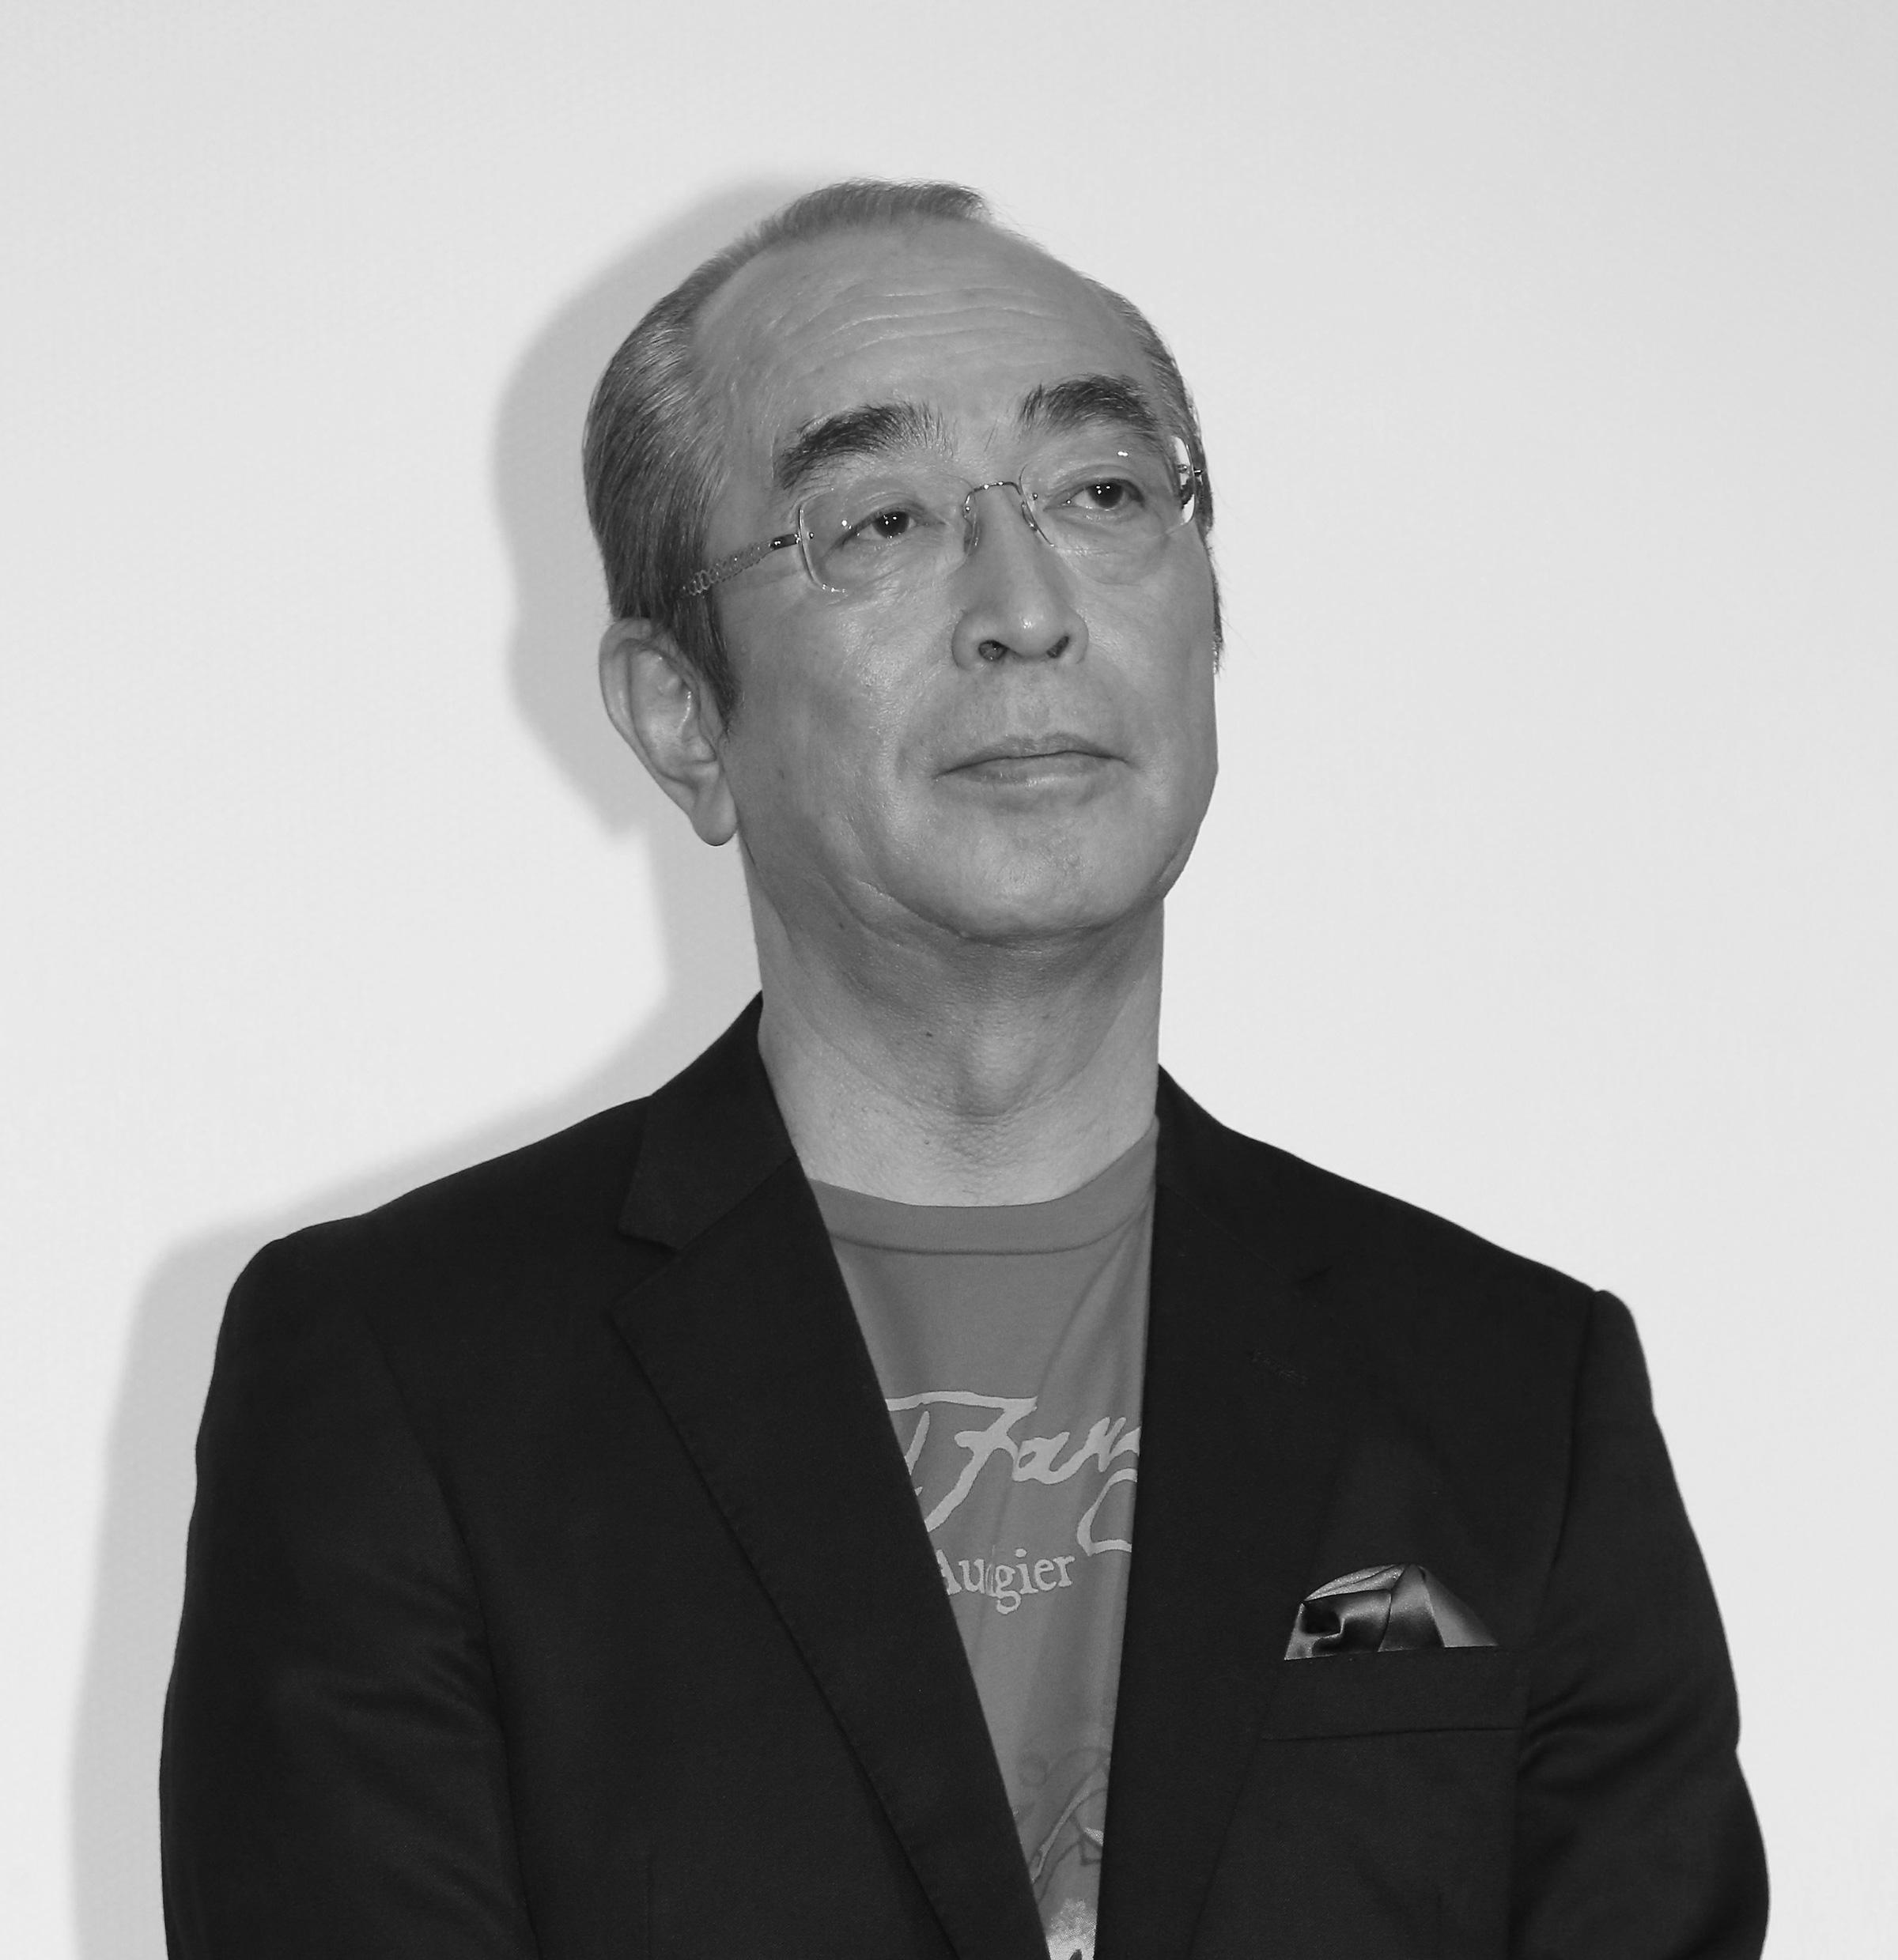 Comedian Ken Shimura in Tokyo on Dec. 20, 2014.